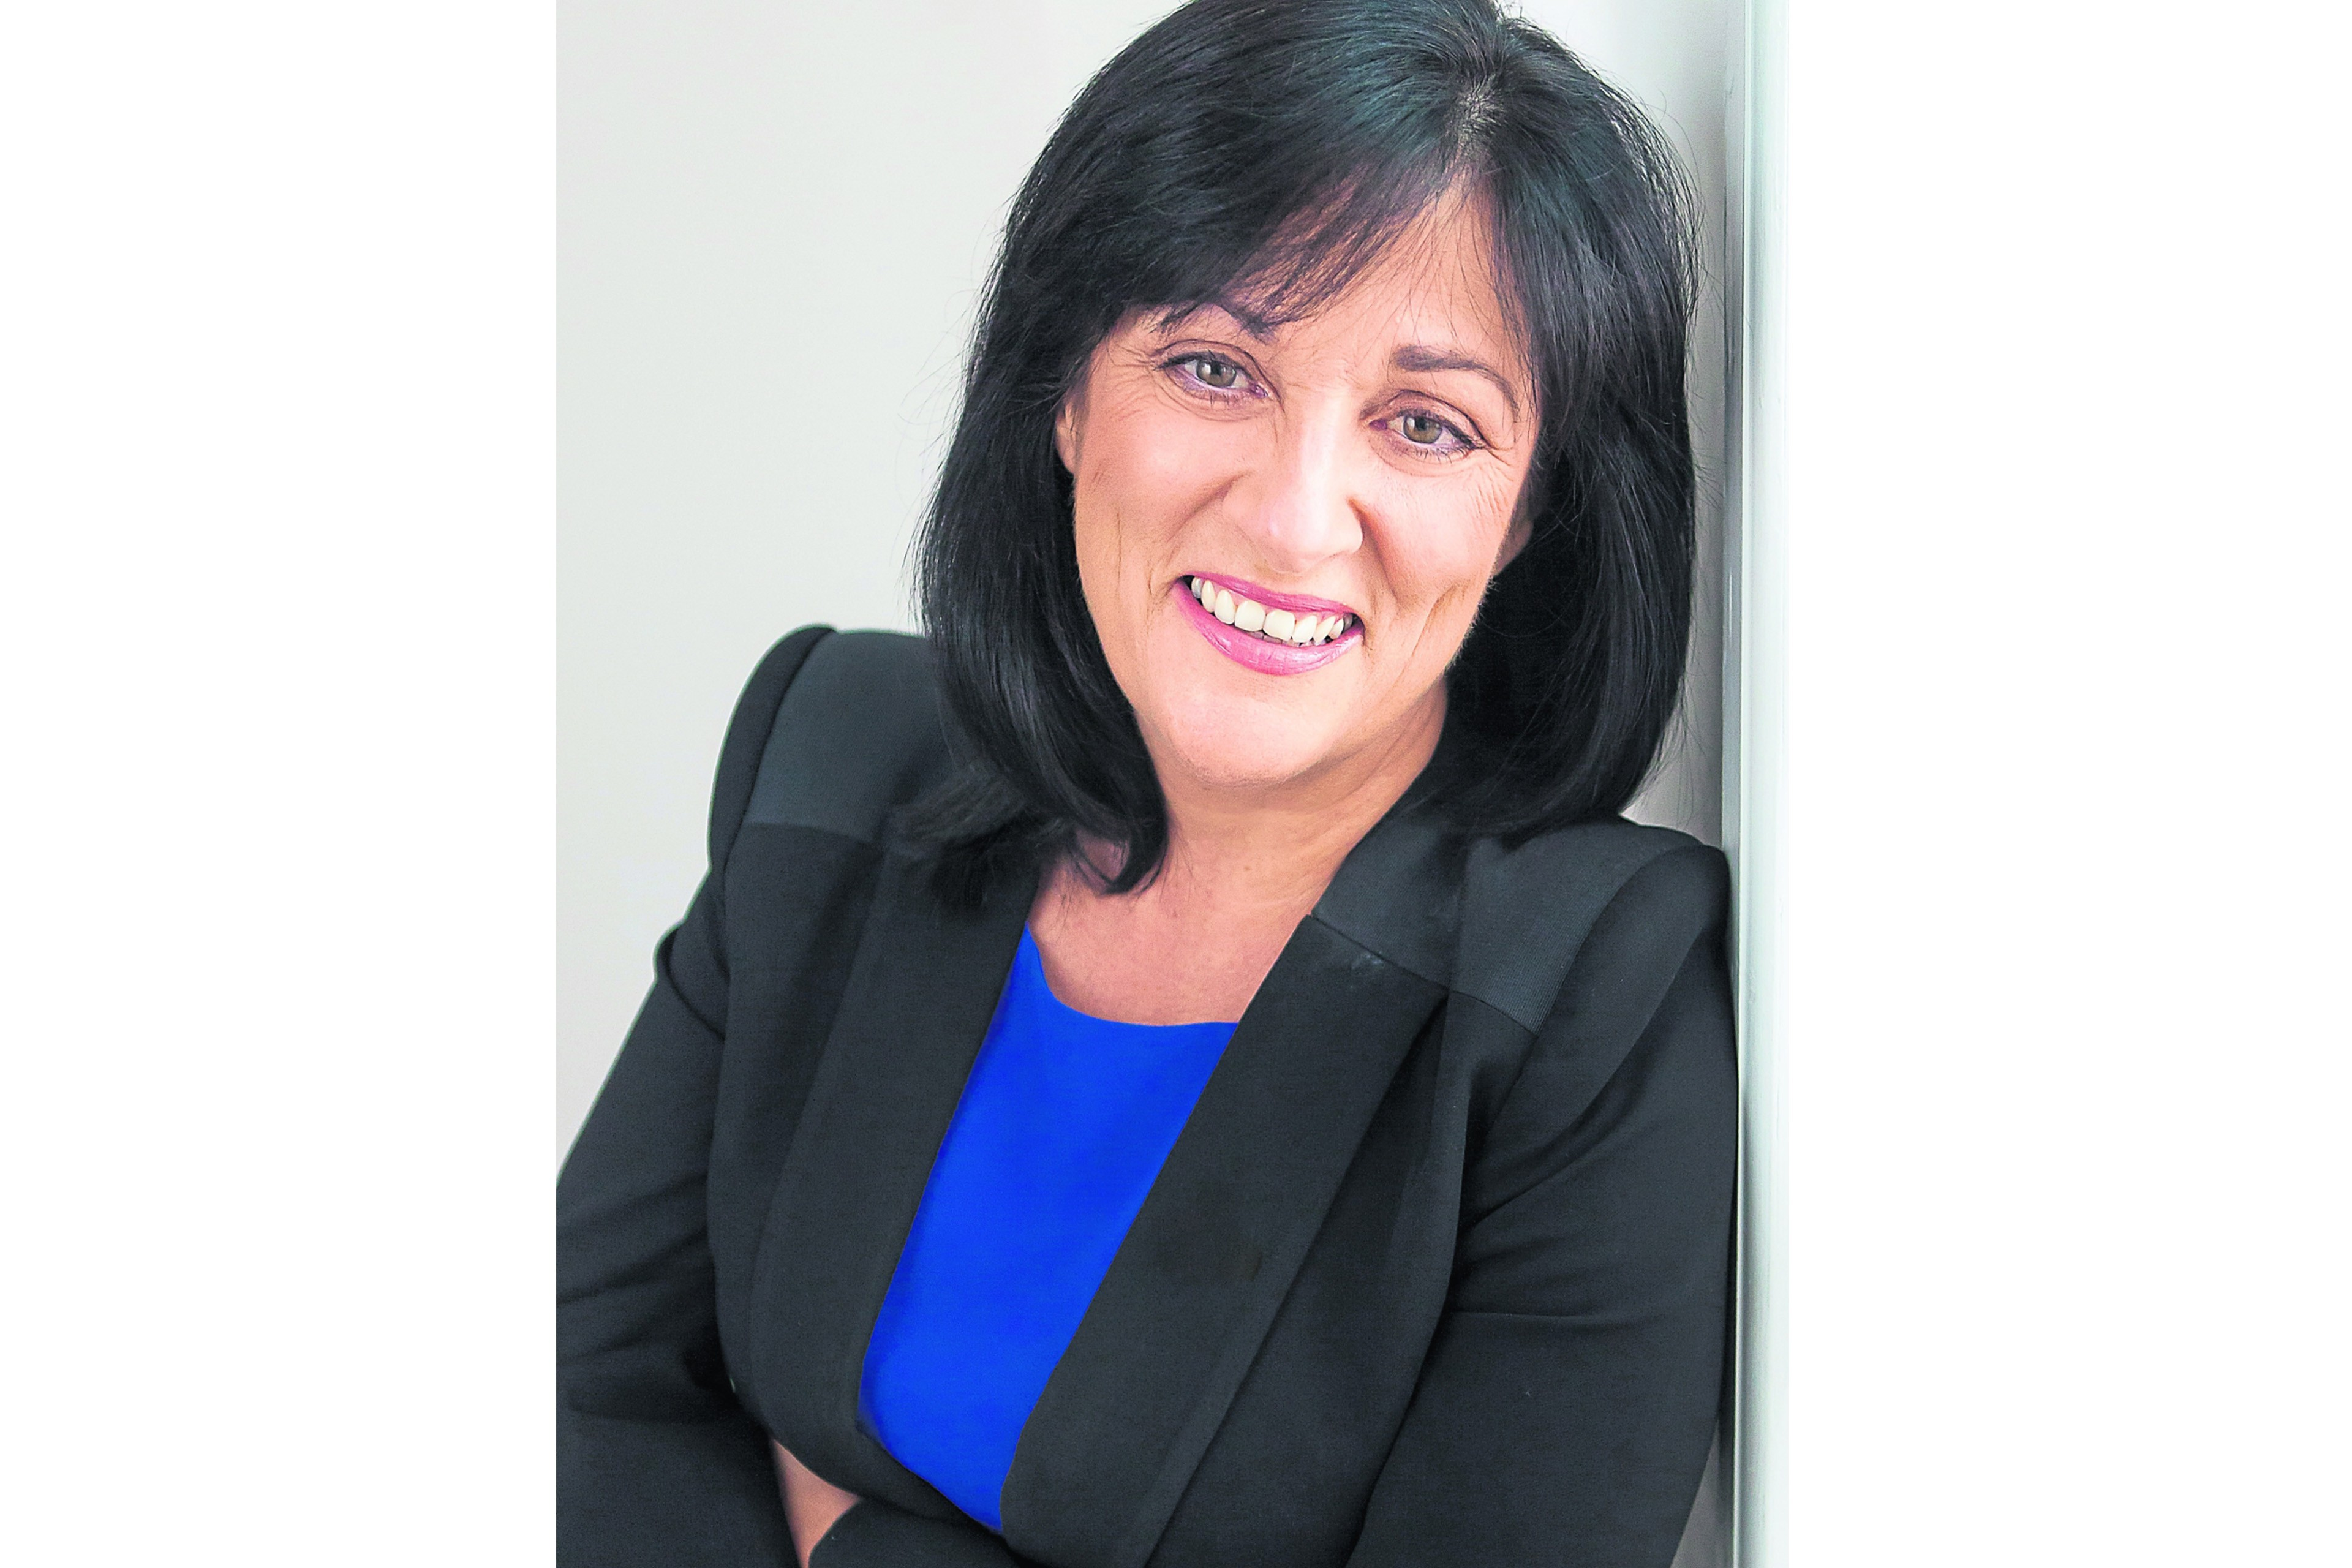 Speaker Anne Heraty